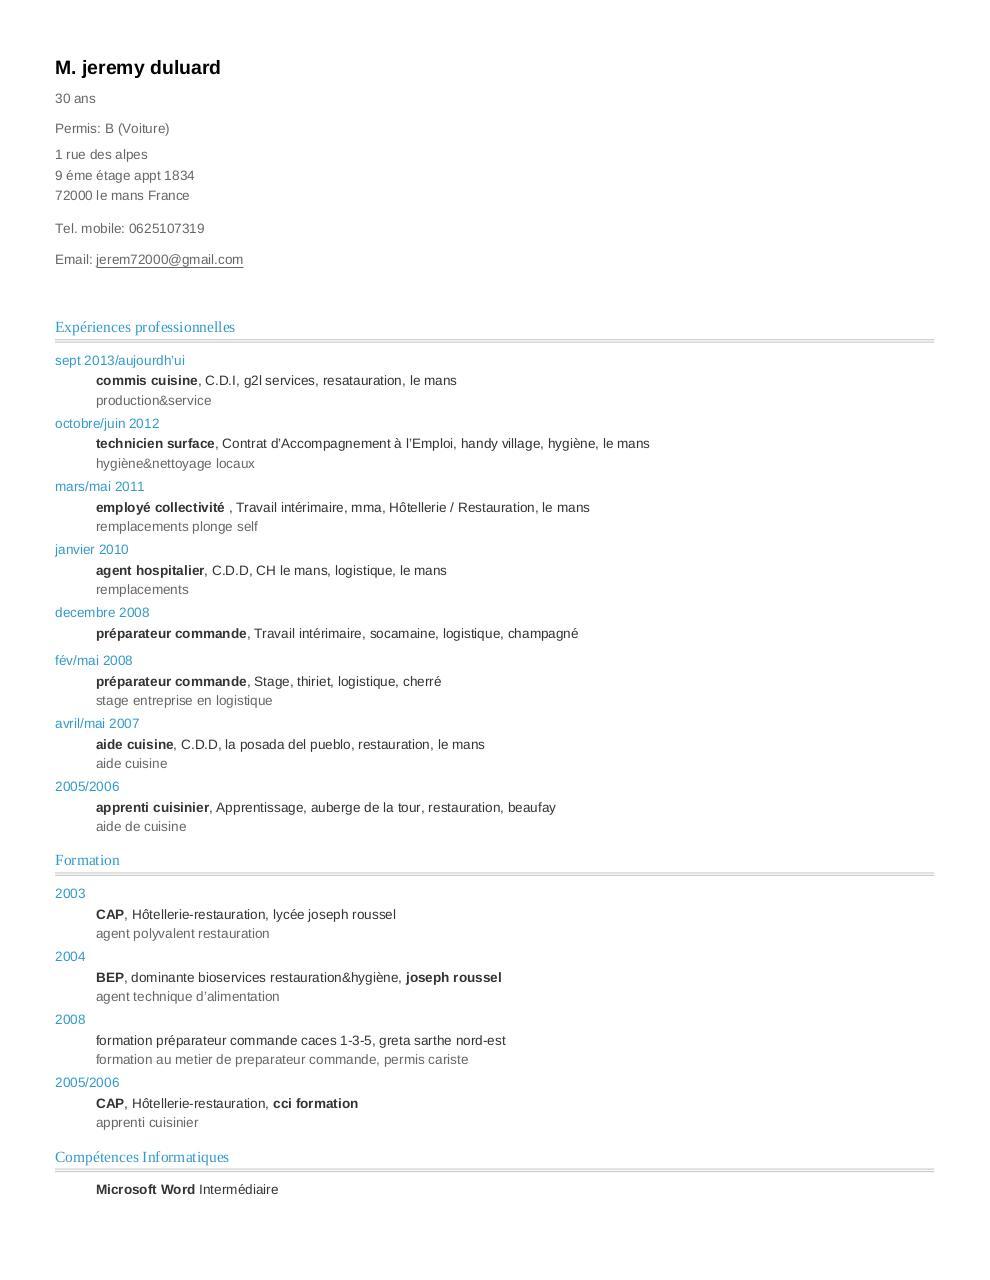 cv de jeremy duluard au format a4 - cv 2014 pdf